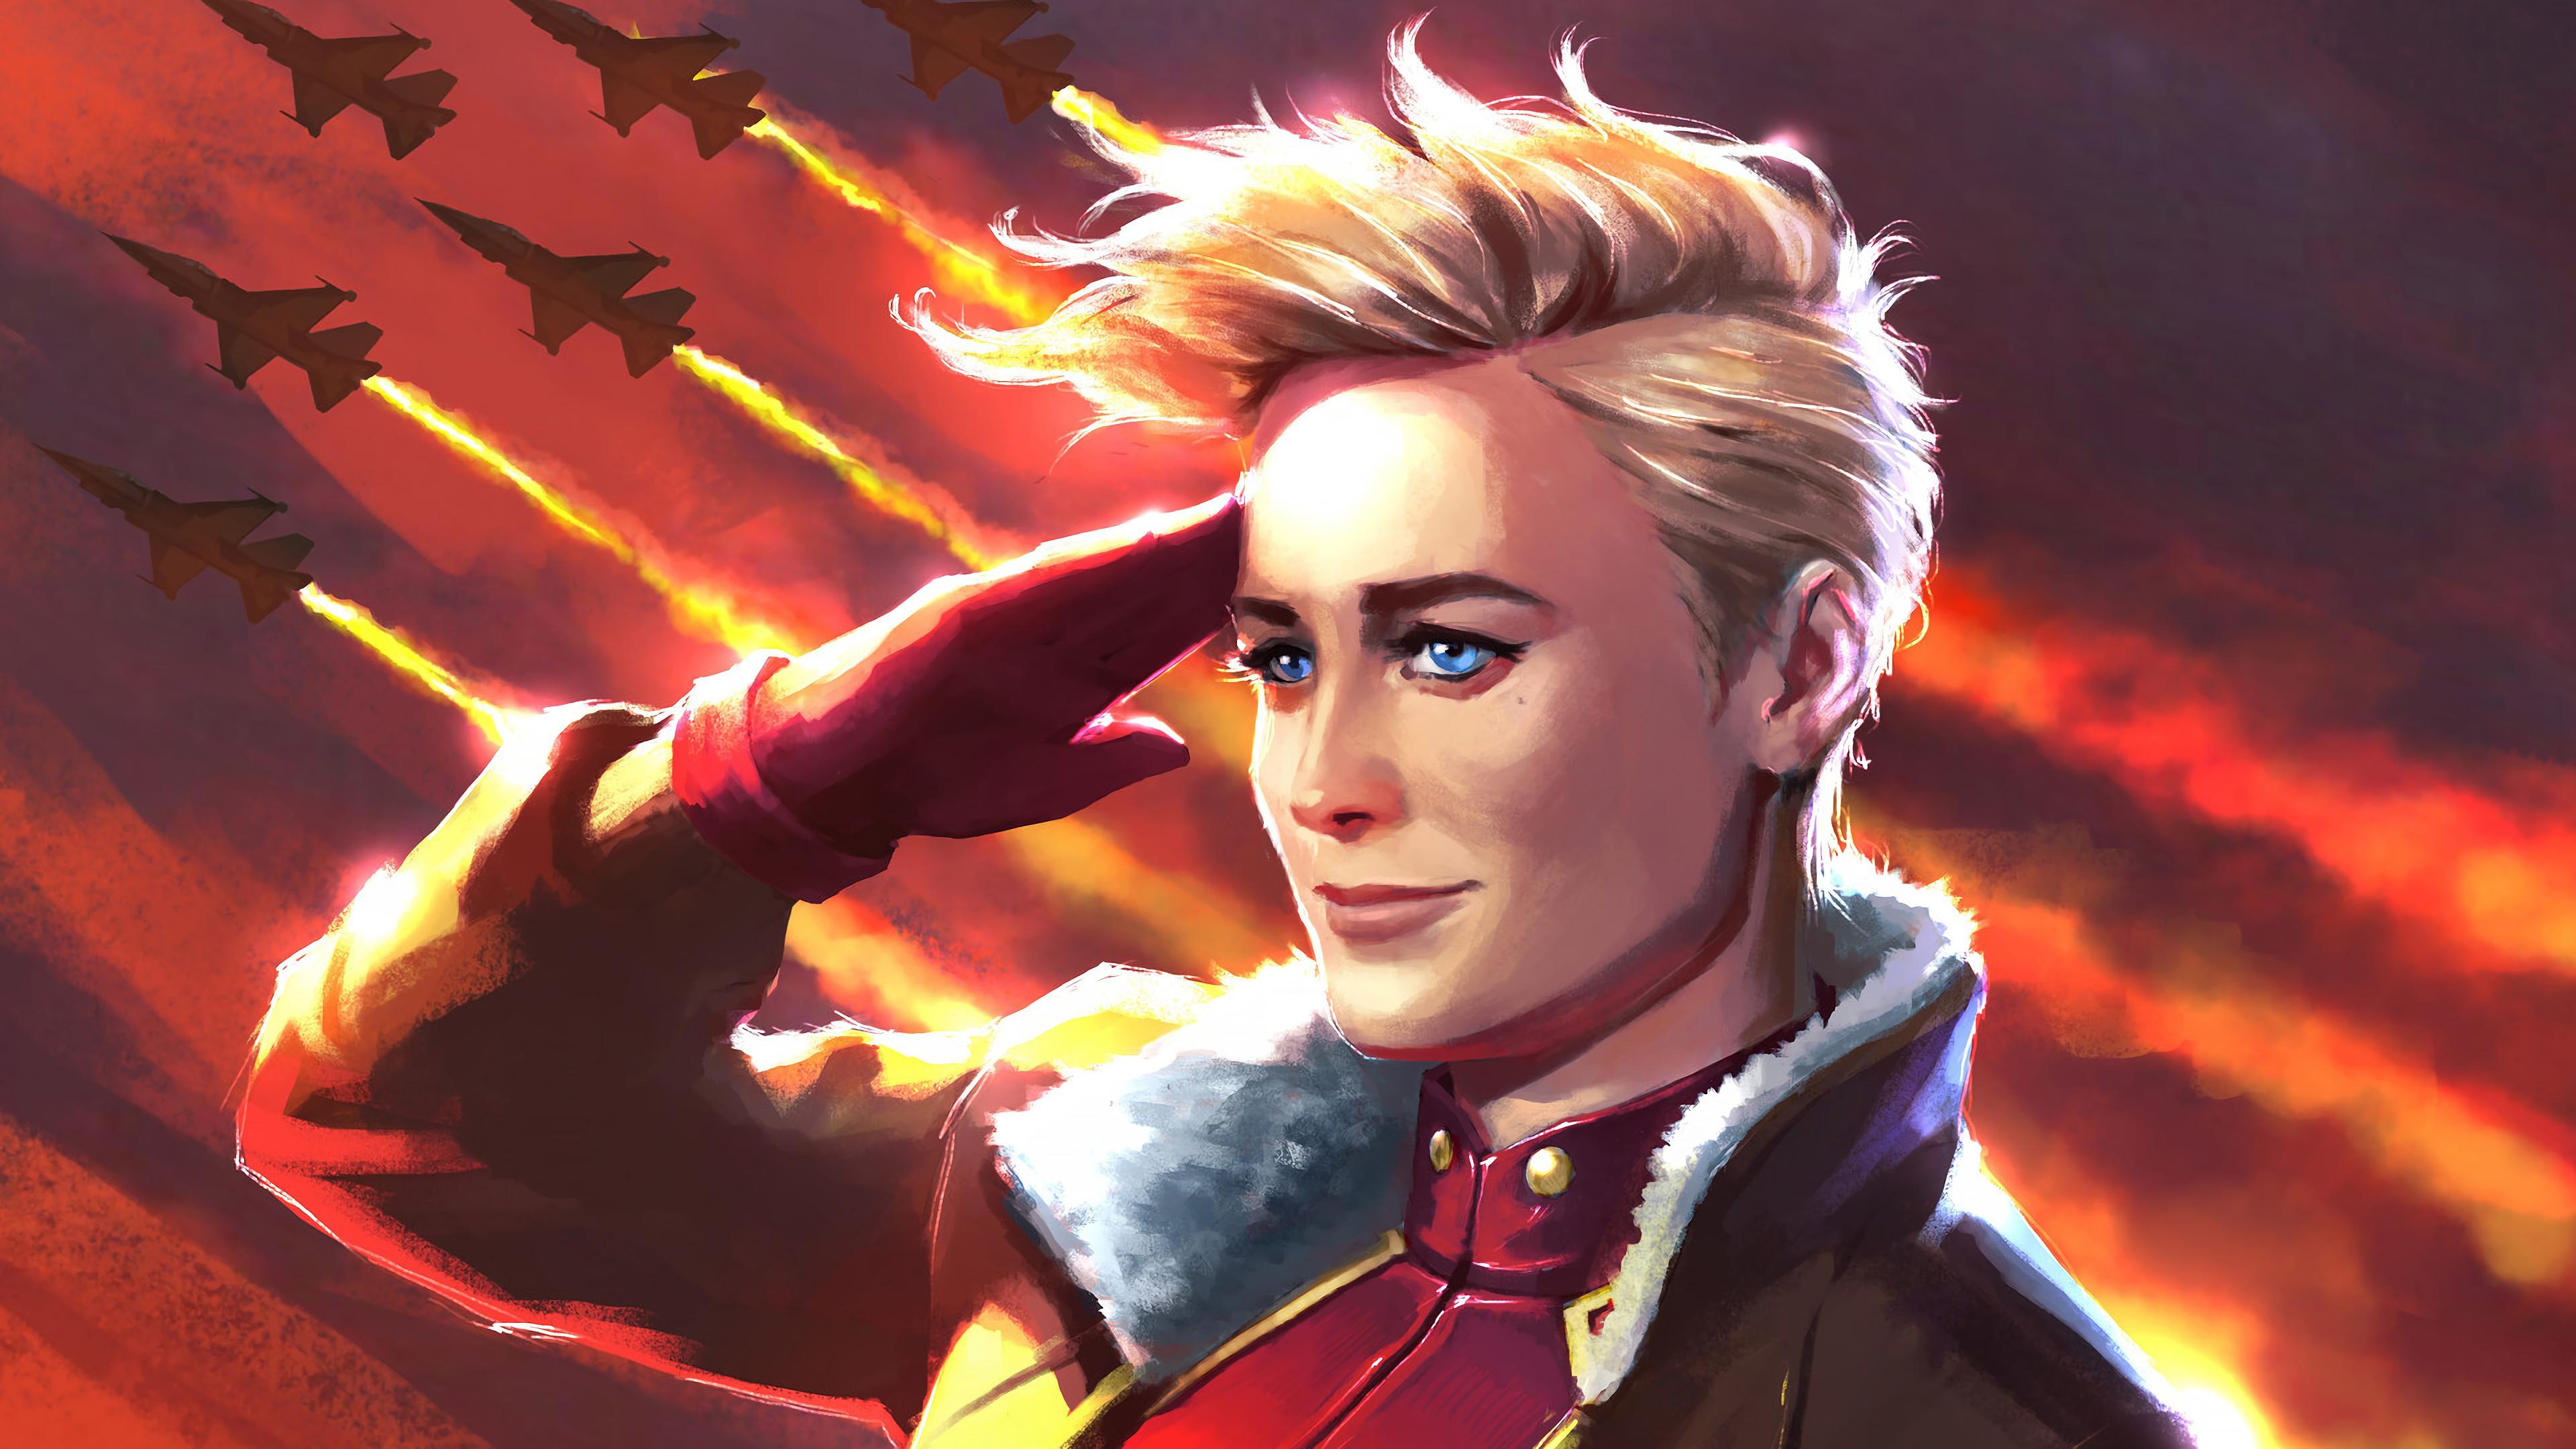 Wallpaper 4k Captain Marvel Movie 2019 Art Carol Danvers 4k